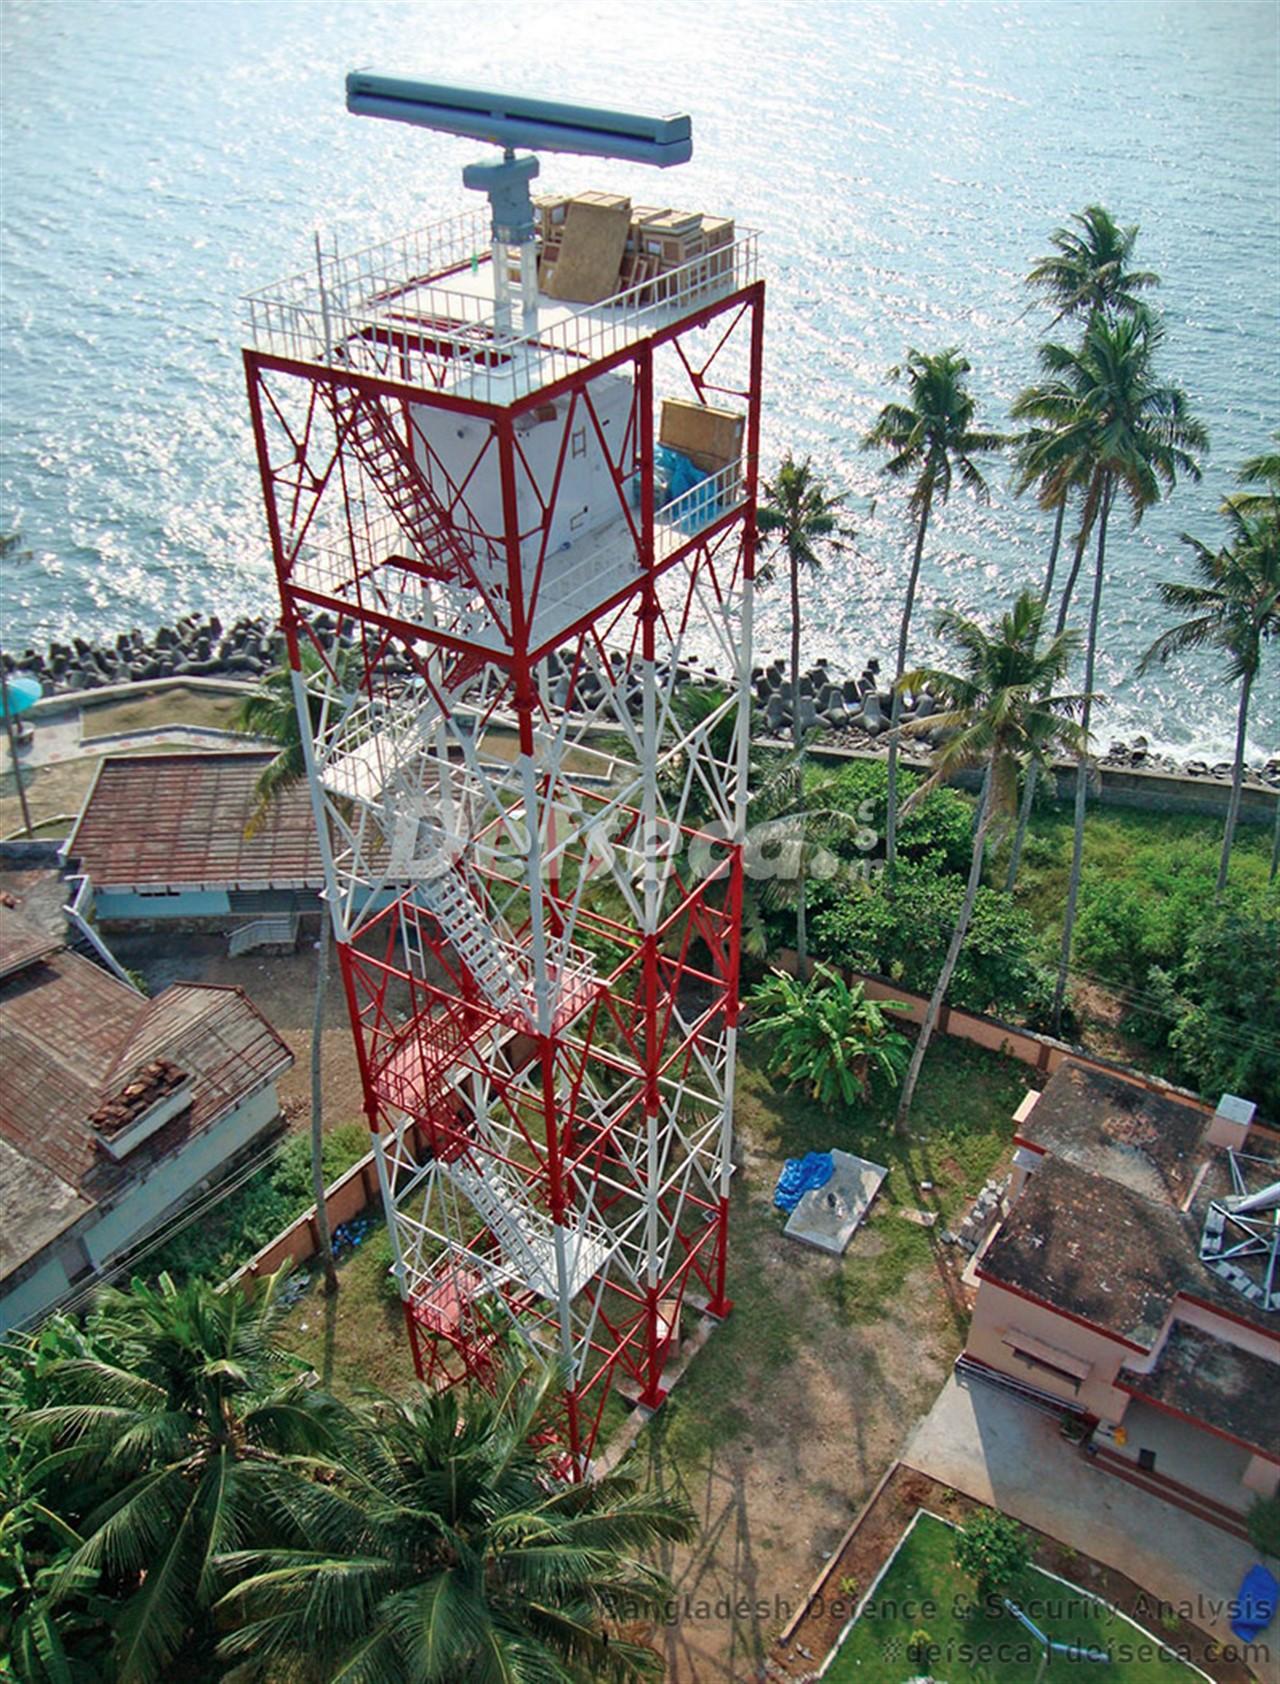 Bangladesh Coast Guard to use Indian made coastal surveillance system